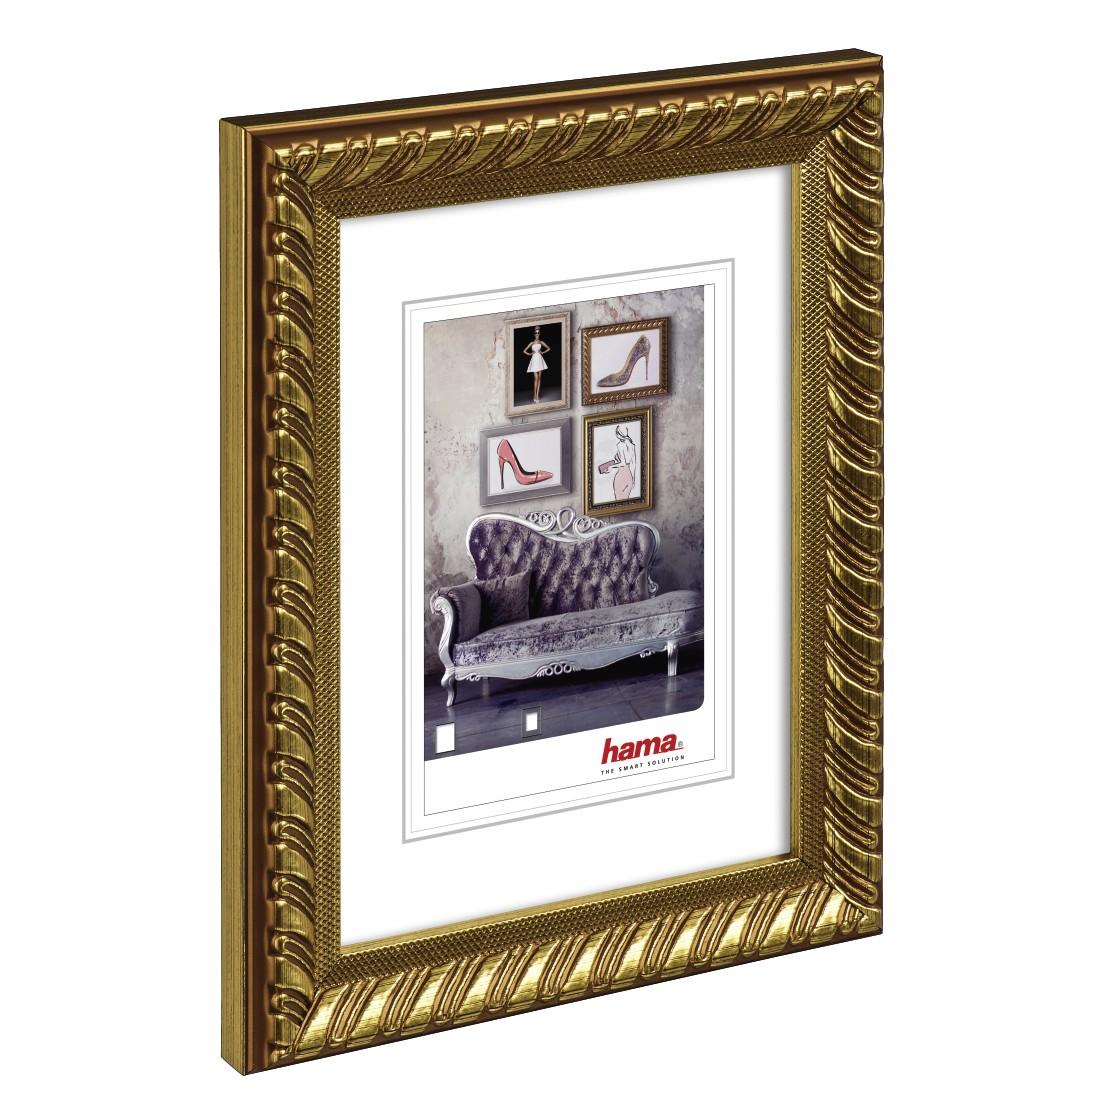 00175368 Hama Plastic Frame Elba Small 10 X 15 Cm Ip 25 Pcs